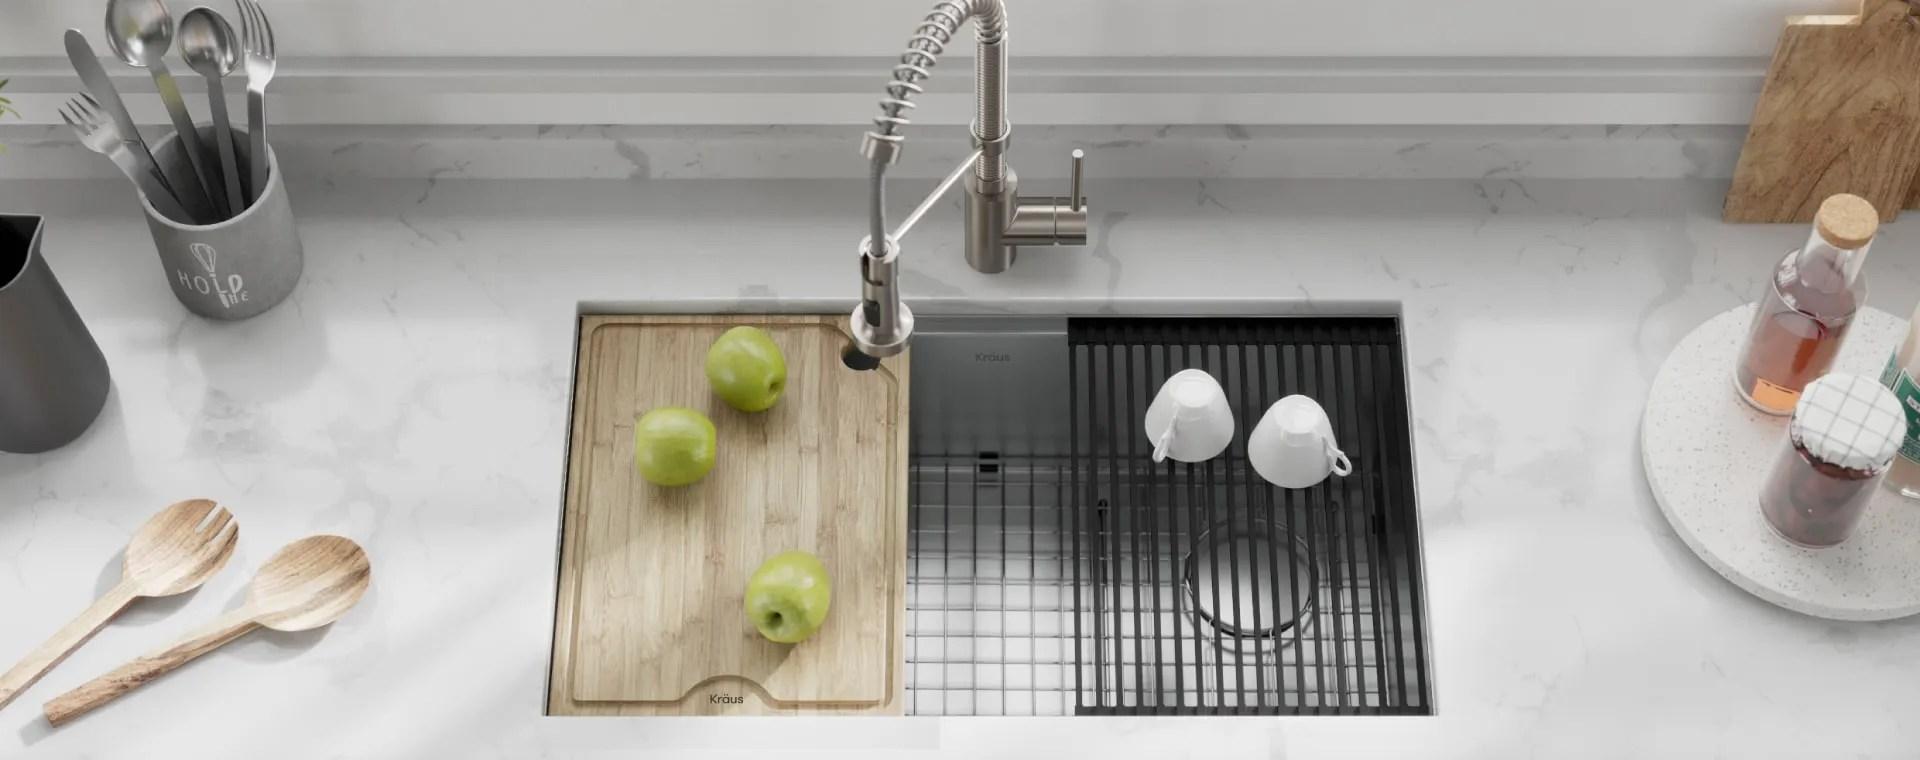 kraus usa workstation sinks kitchens